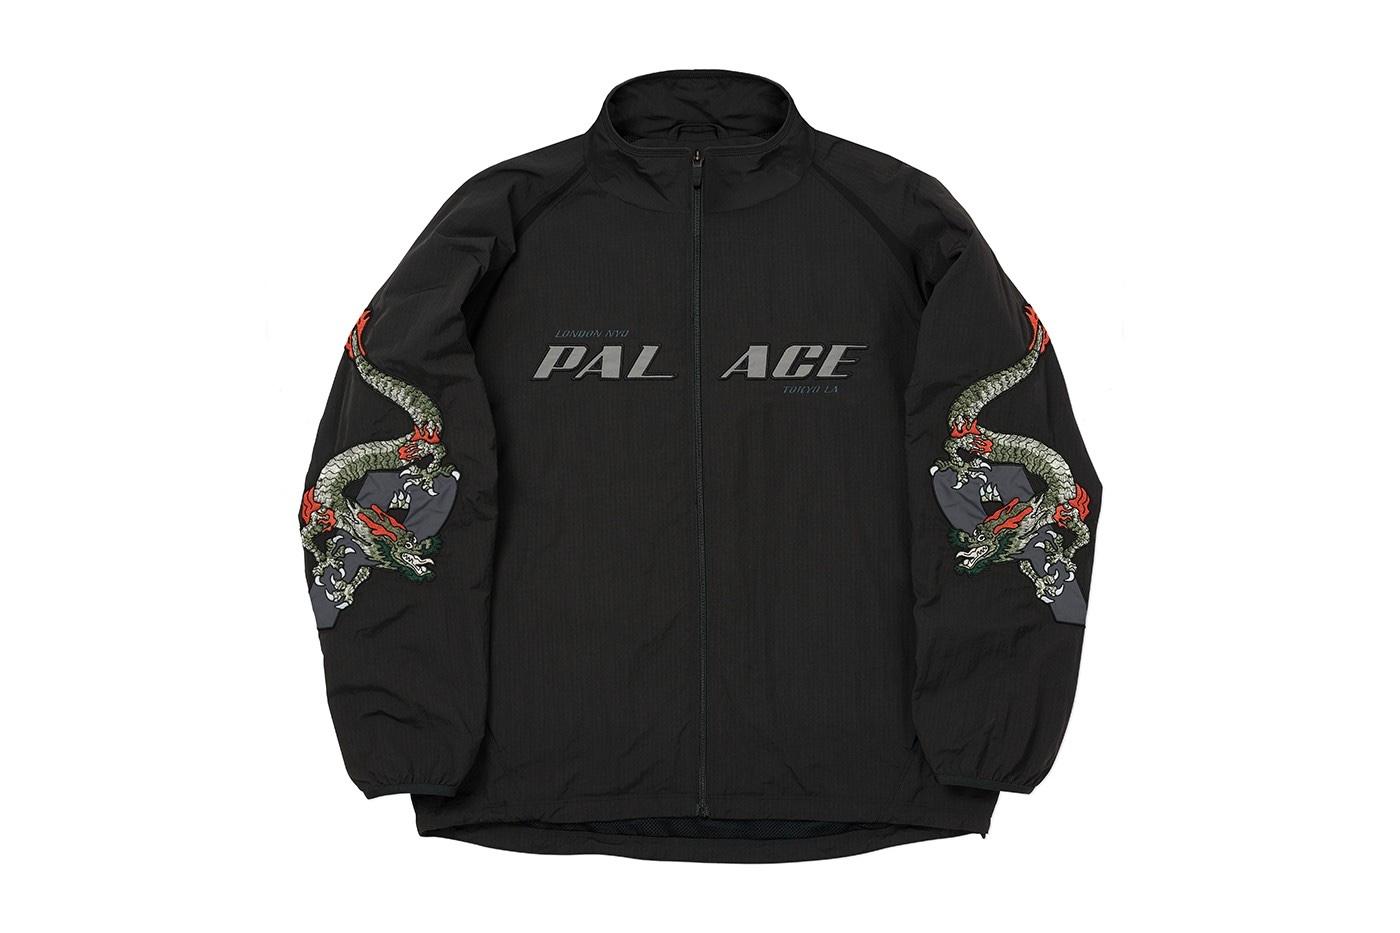 Palace Dragon Jacket